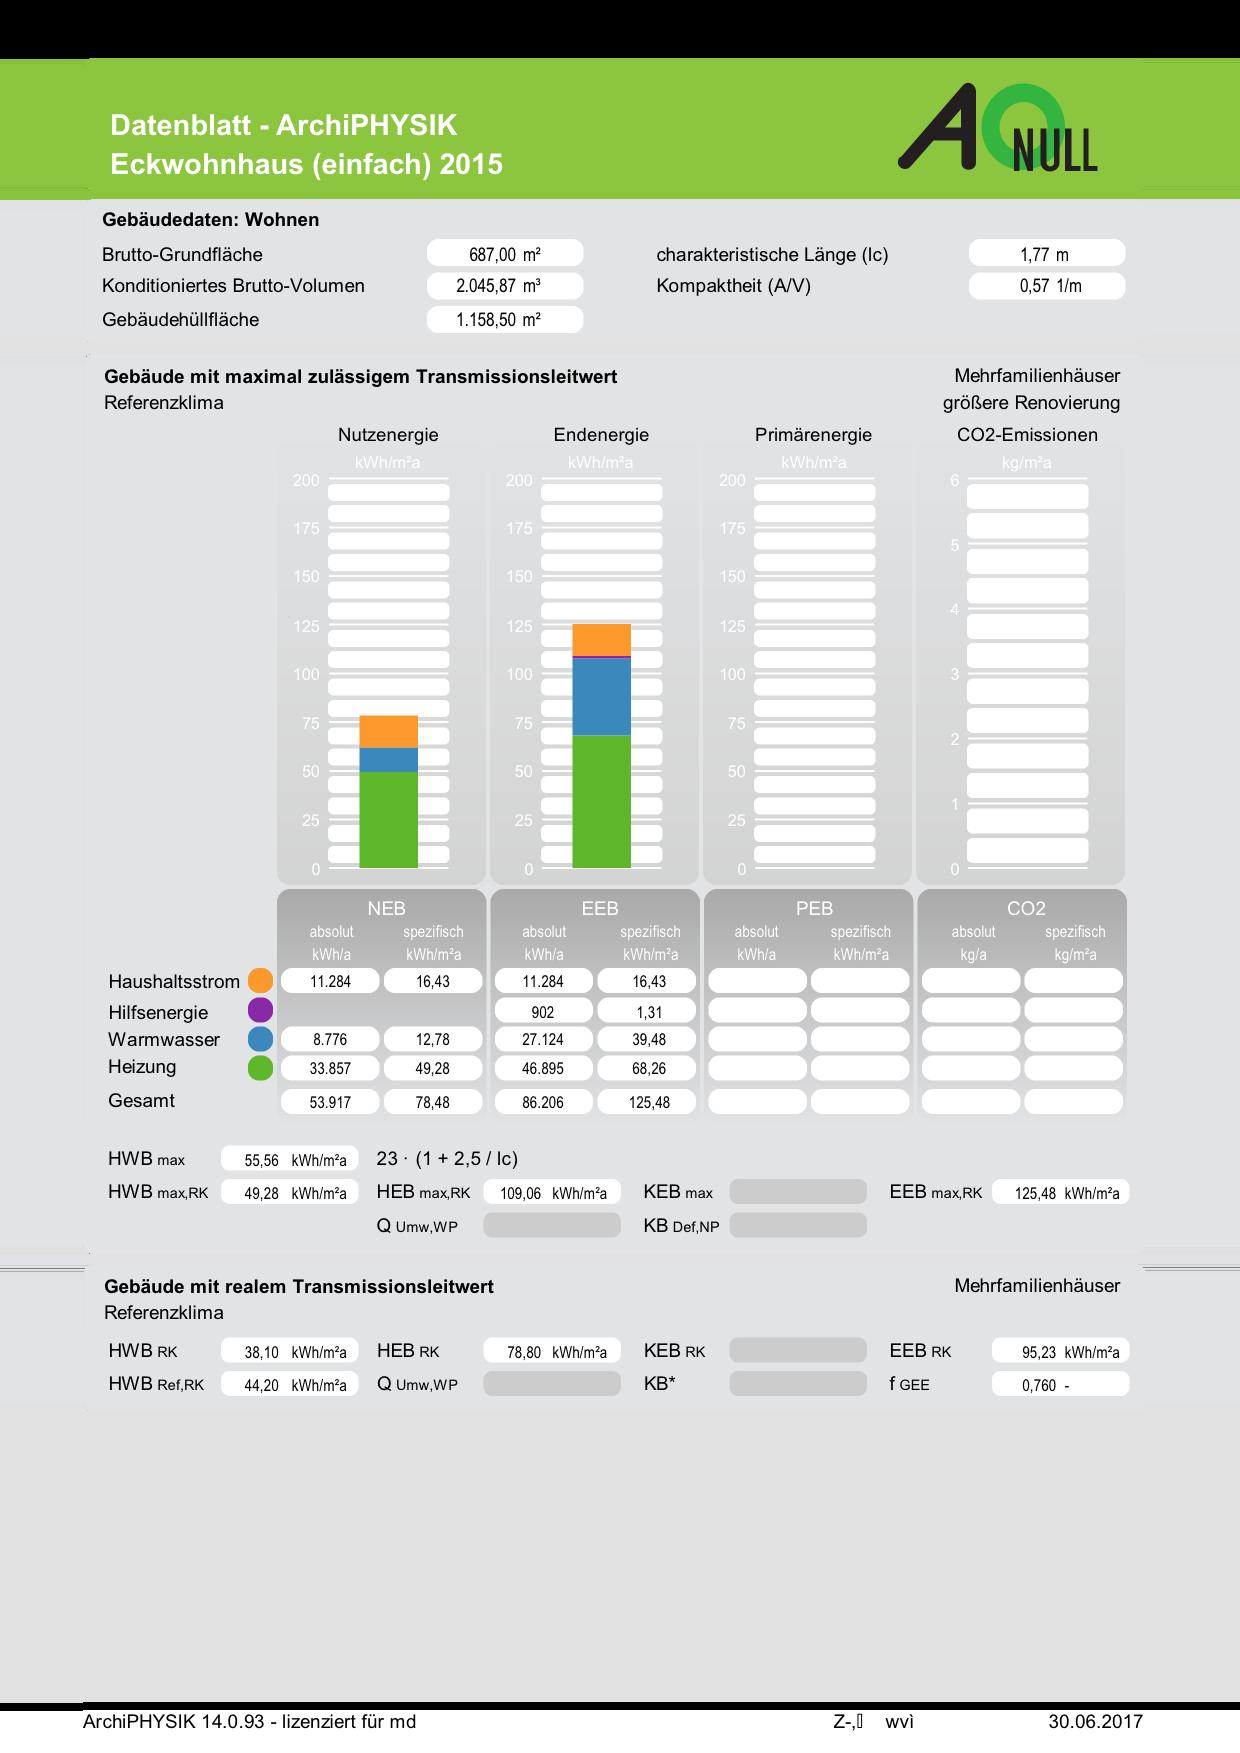 Energieausweis OIB RL6 2015 Wohngebäude Energiebedarf maximal